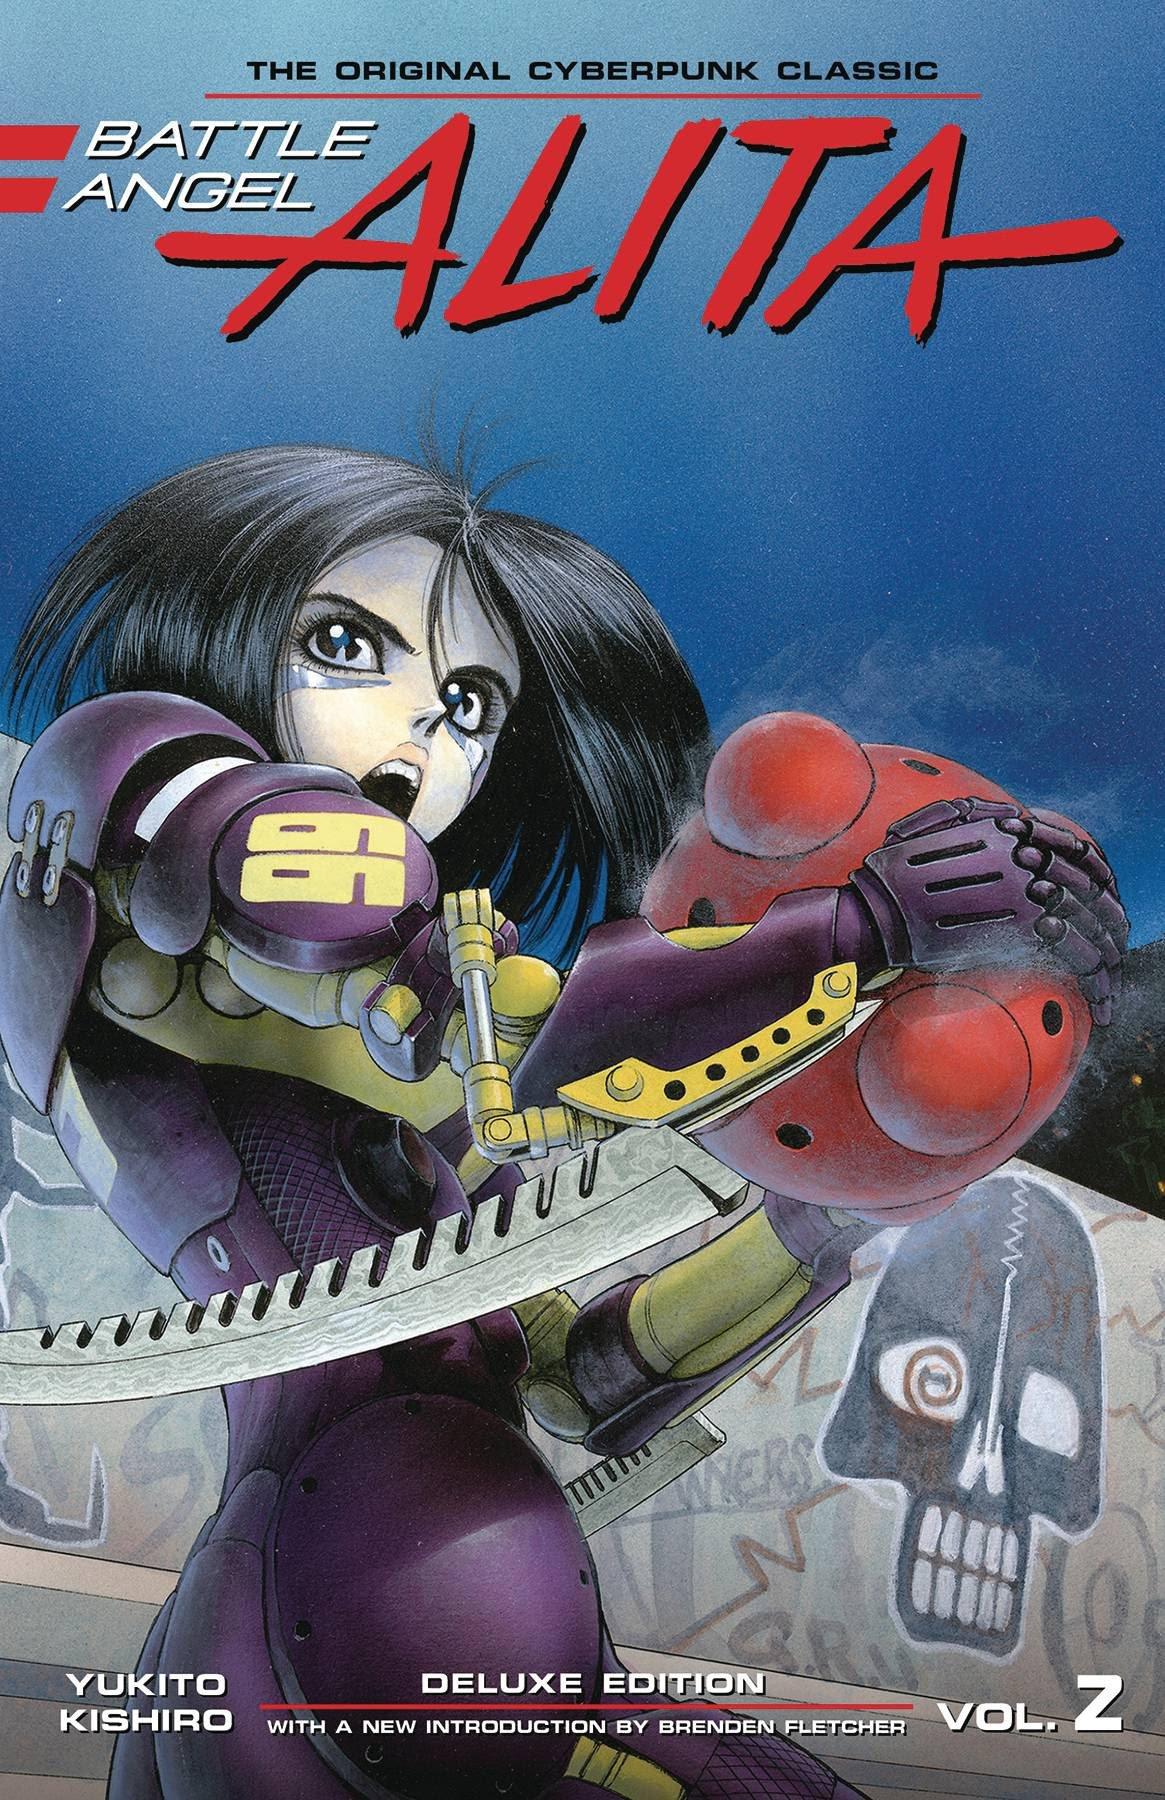 Battle Angel Alita - Volume 02 Deluxe Edtiion